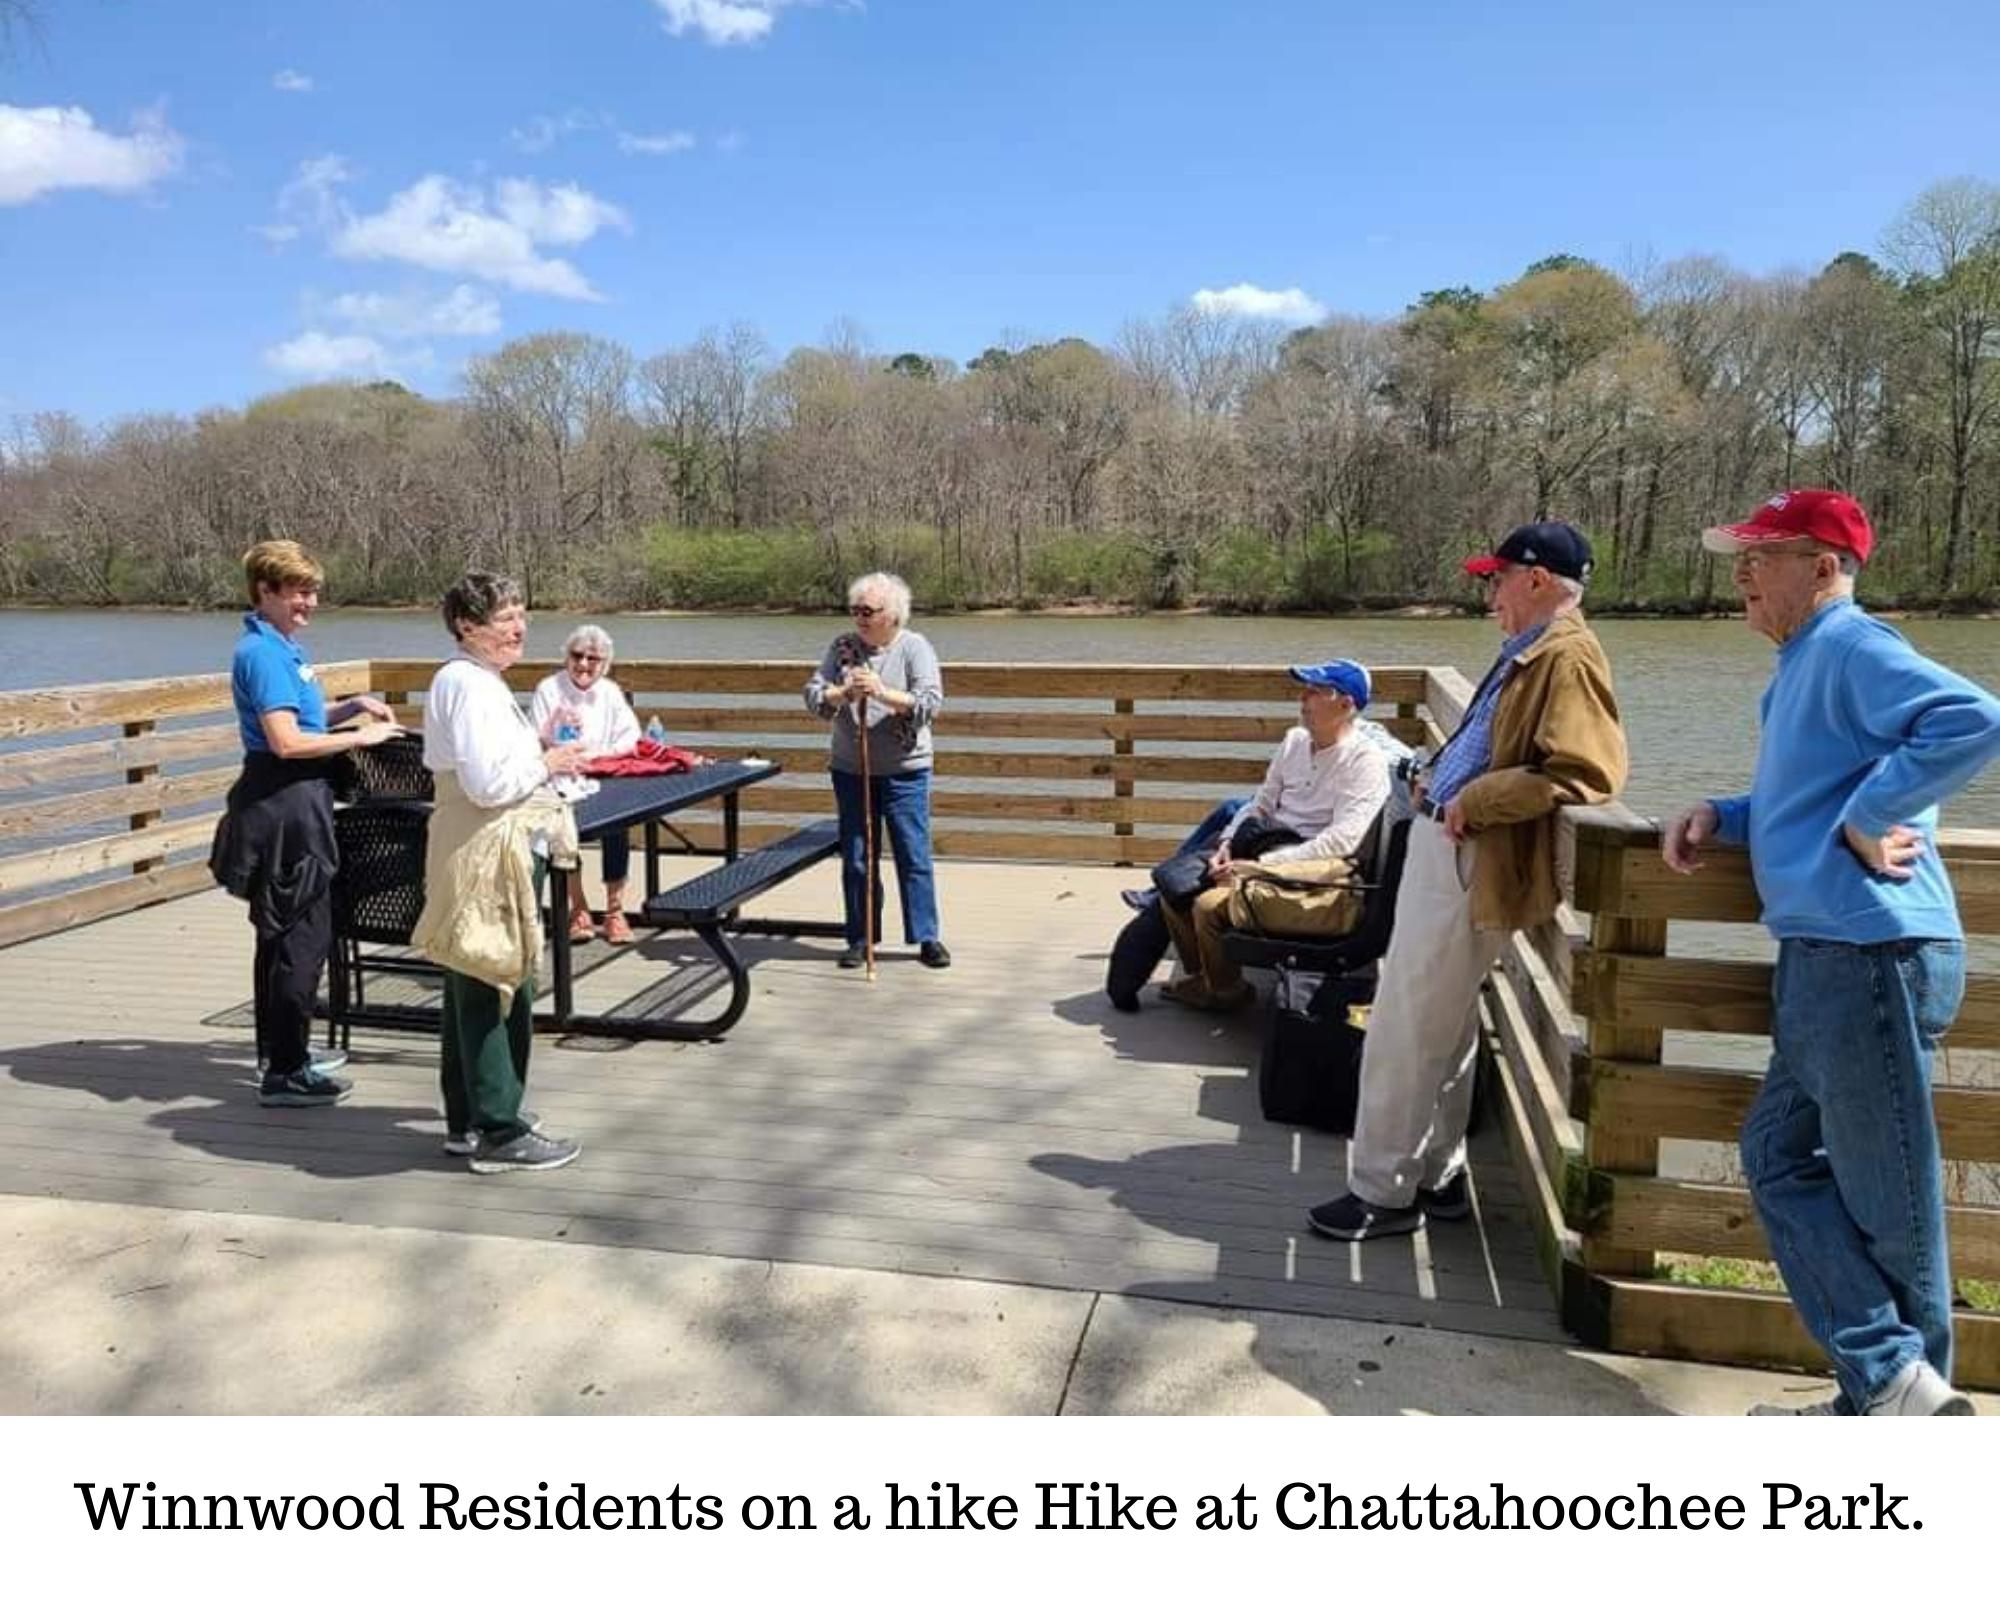 Winnwood Residents on a hike Hike at Chattahoochee Park.